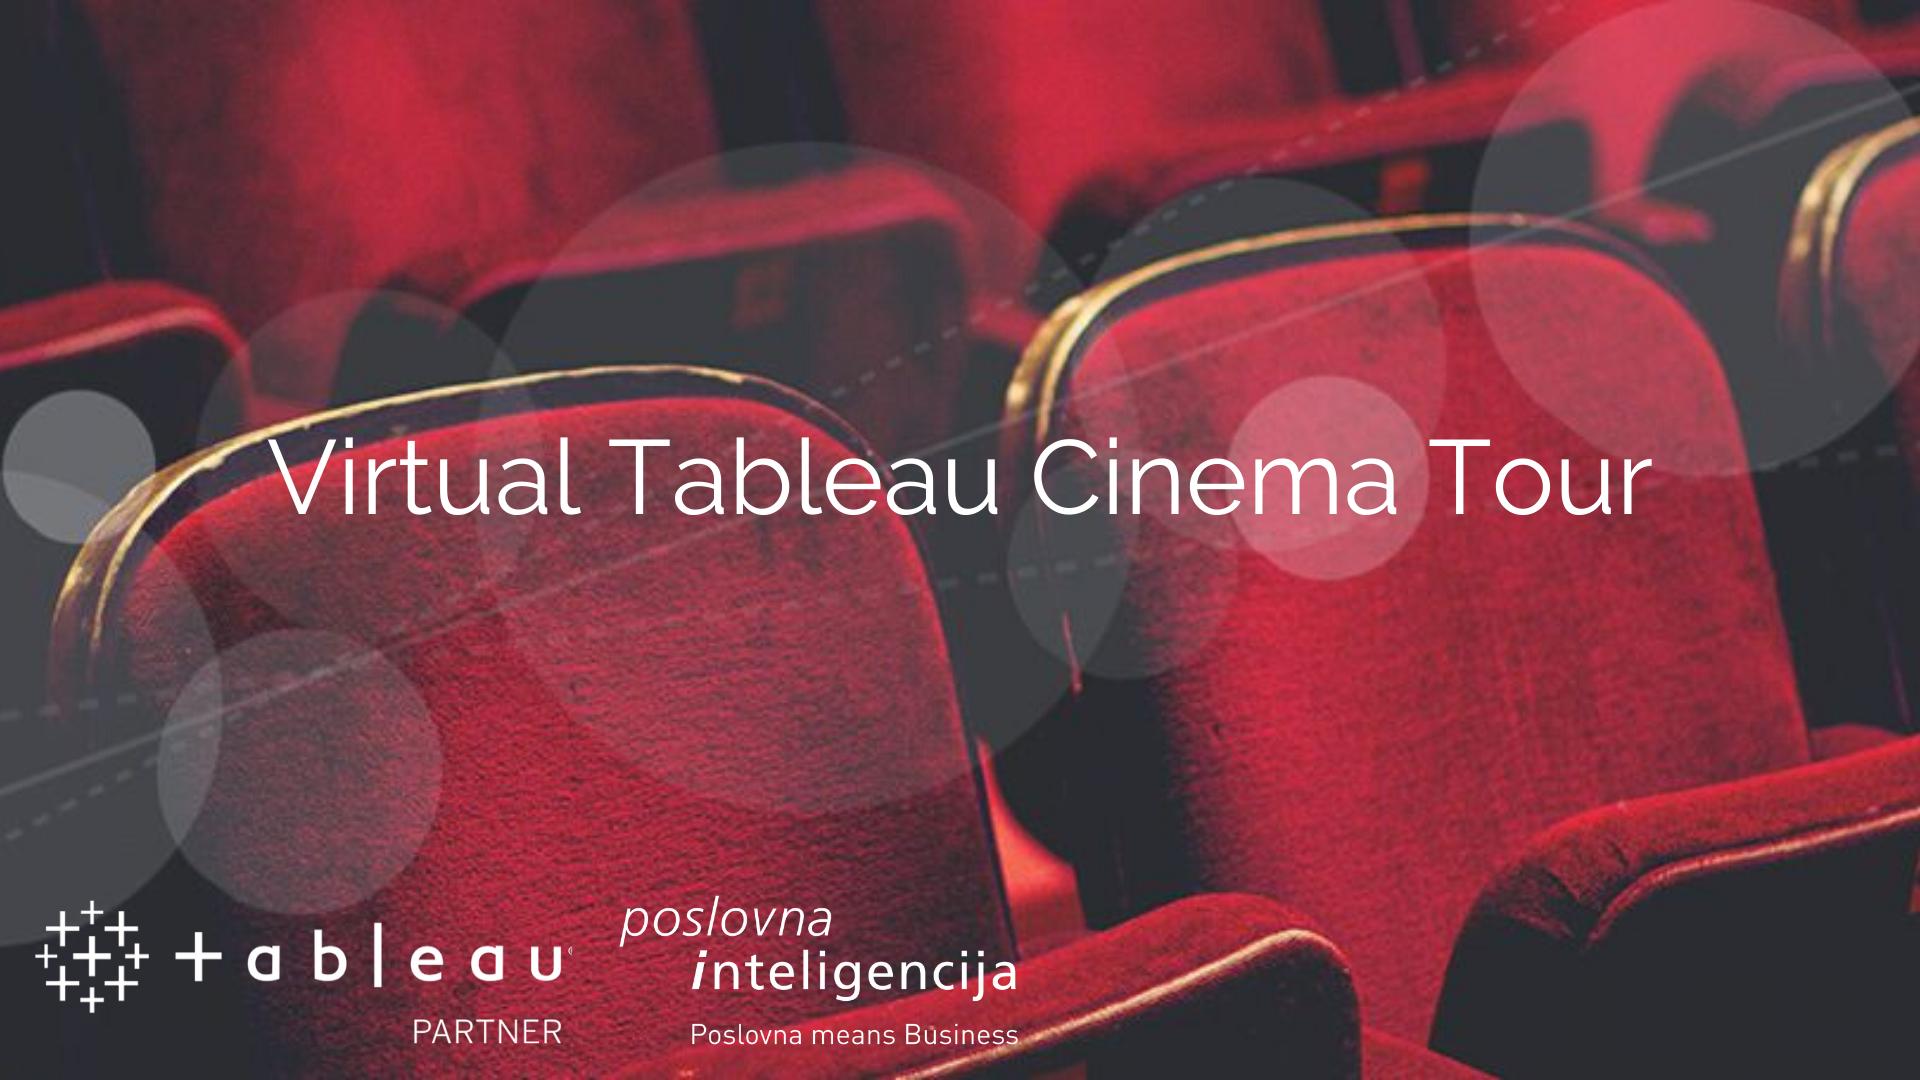 Vitrual tableau cinema tour - Poslovna inteligencija